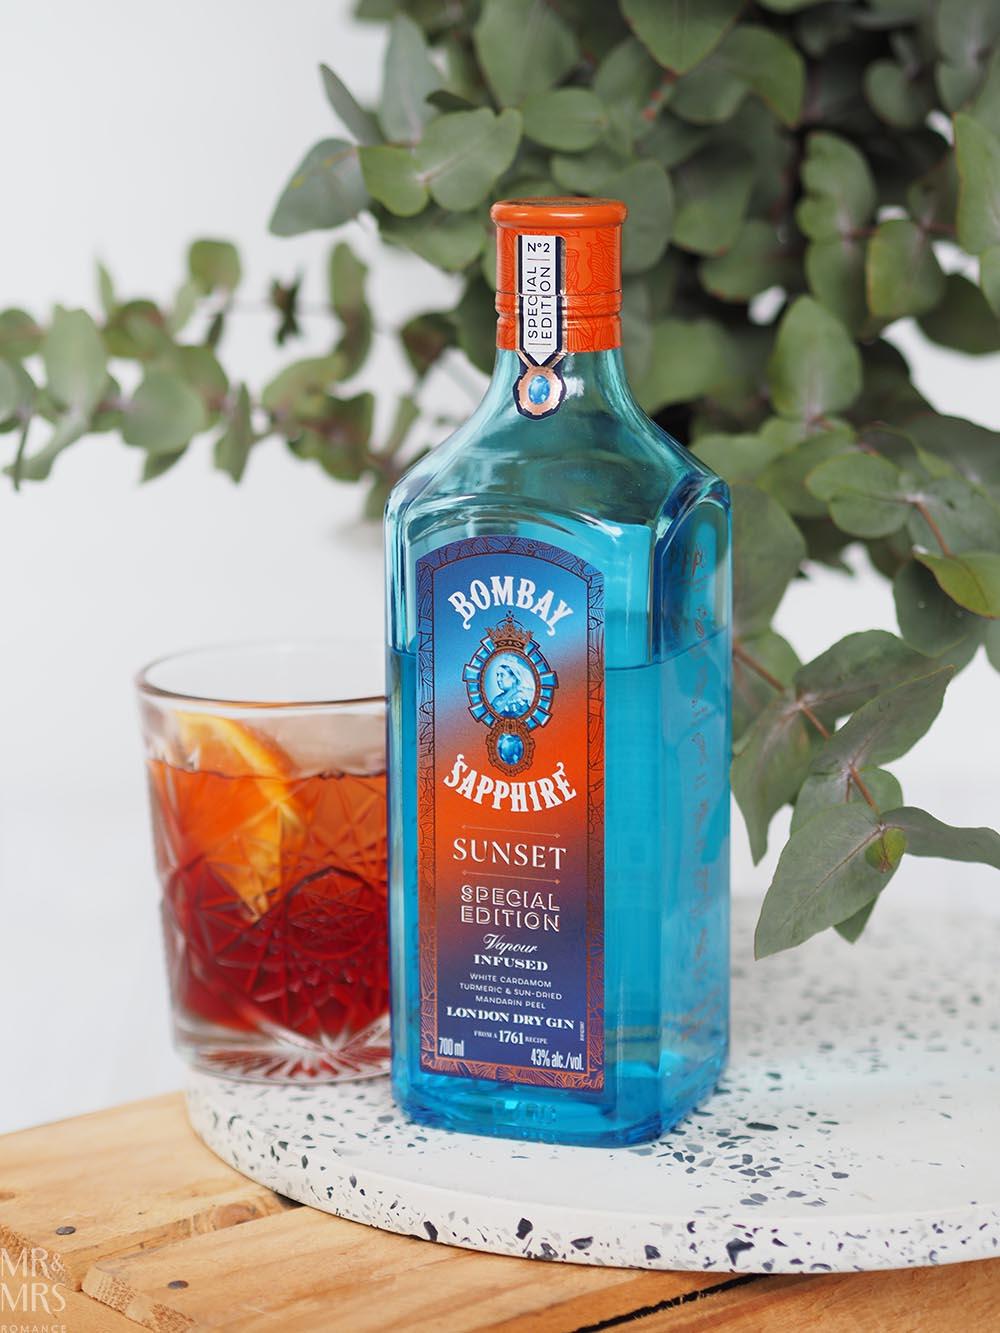 Negroni cocktail Bombay Sapphire Sunset gin